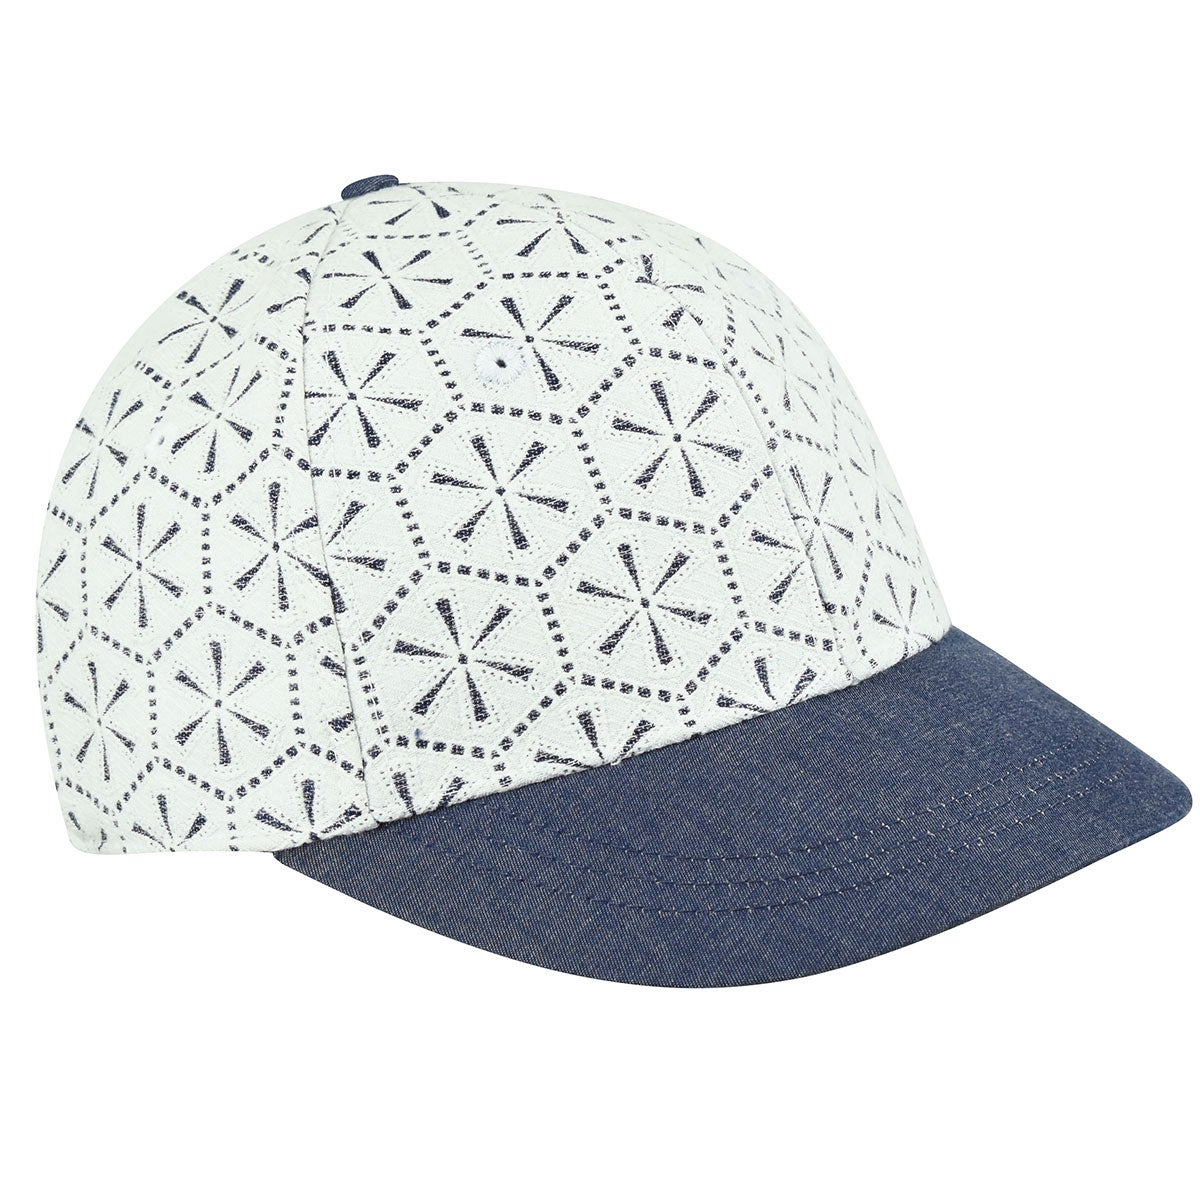 Betmar Lace Baseball Cap in White,Denim